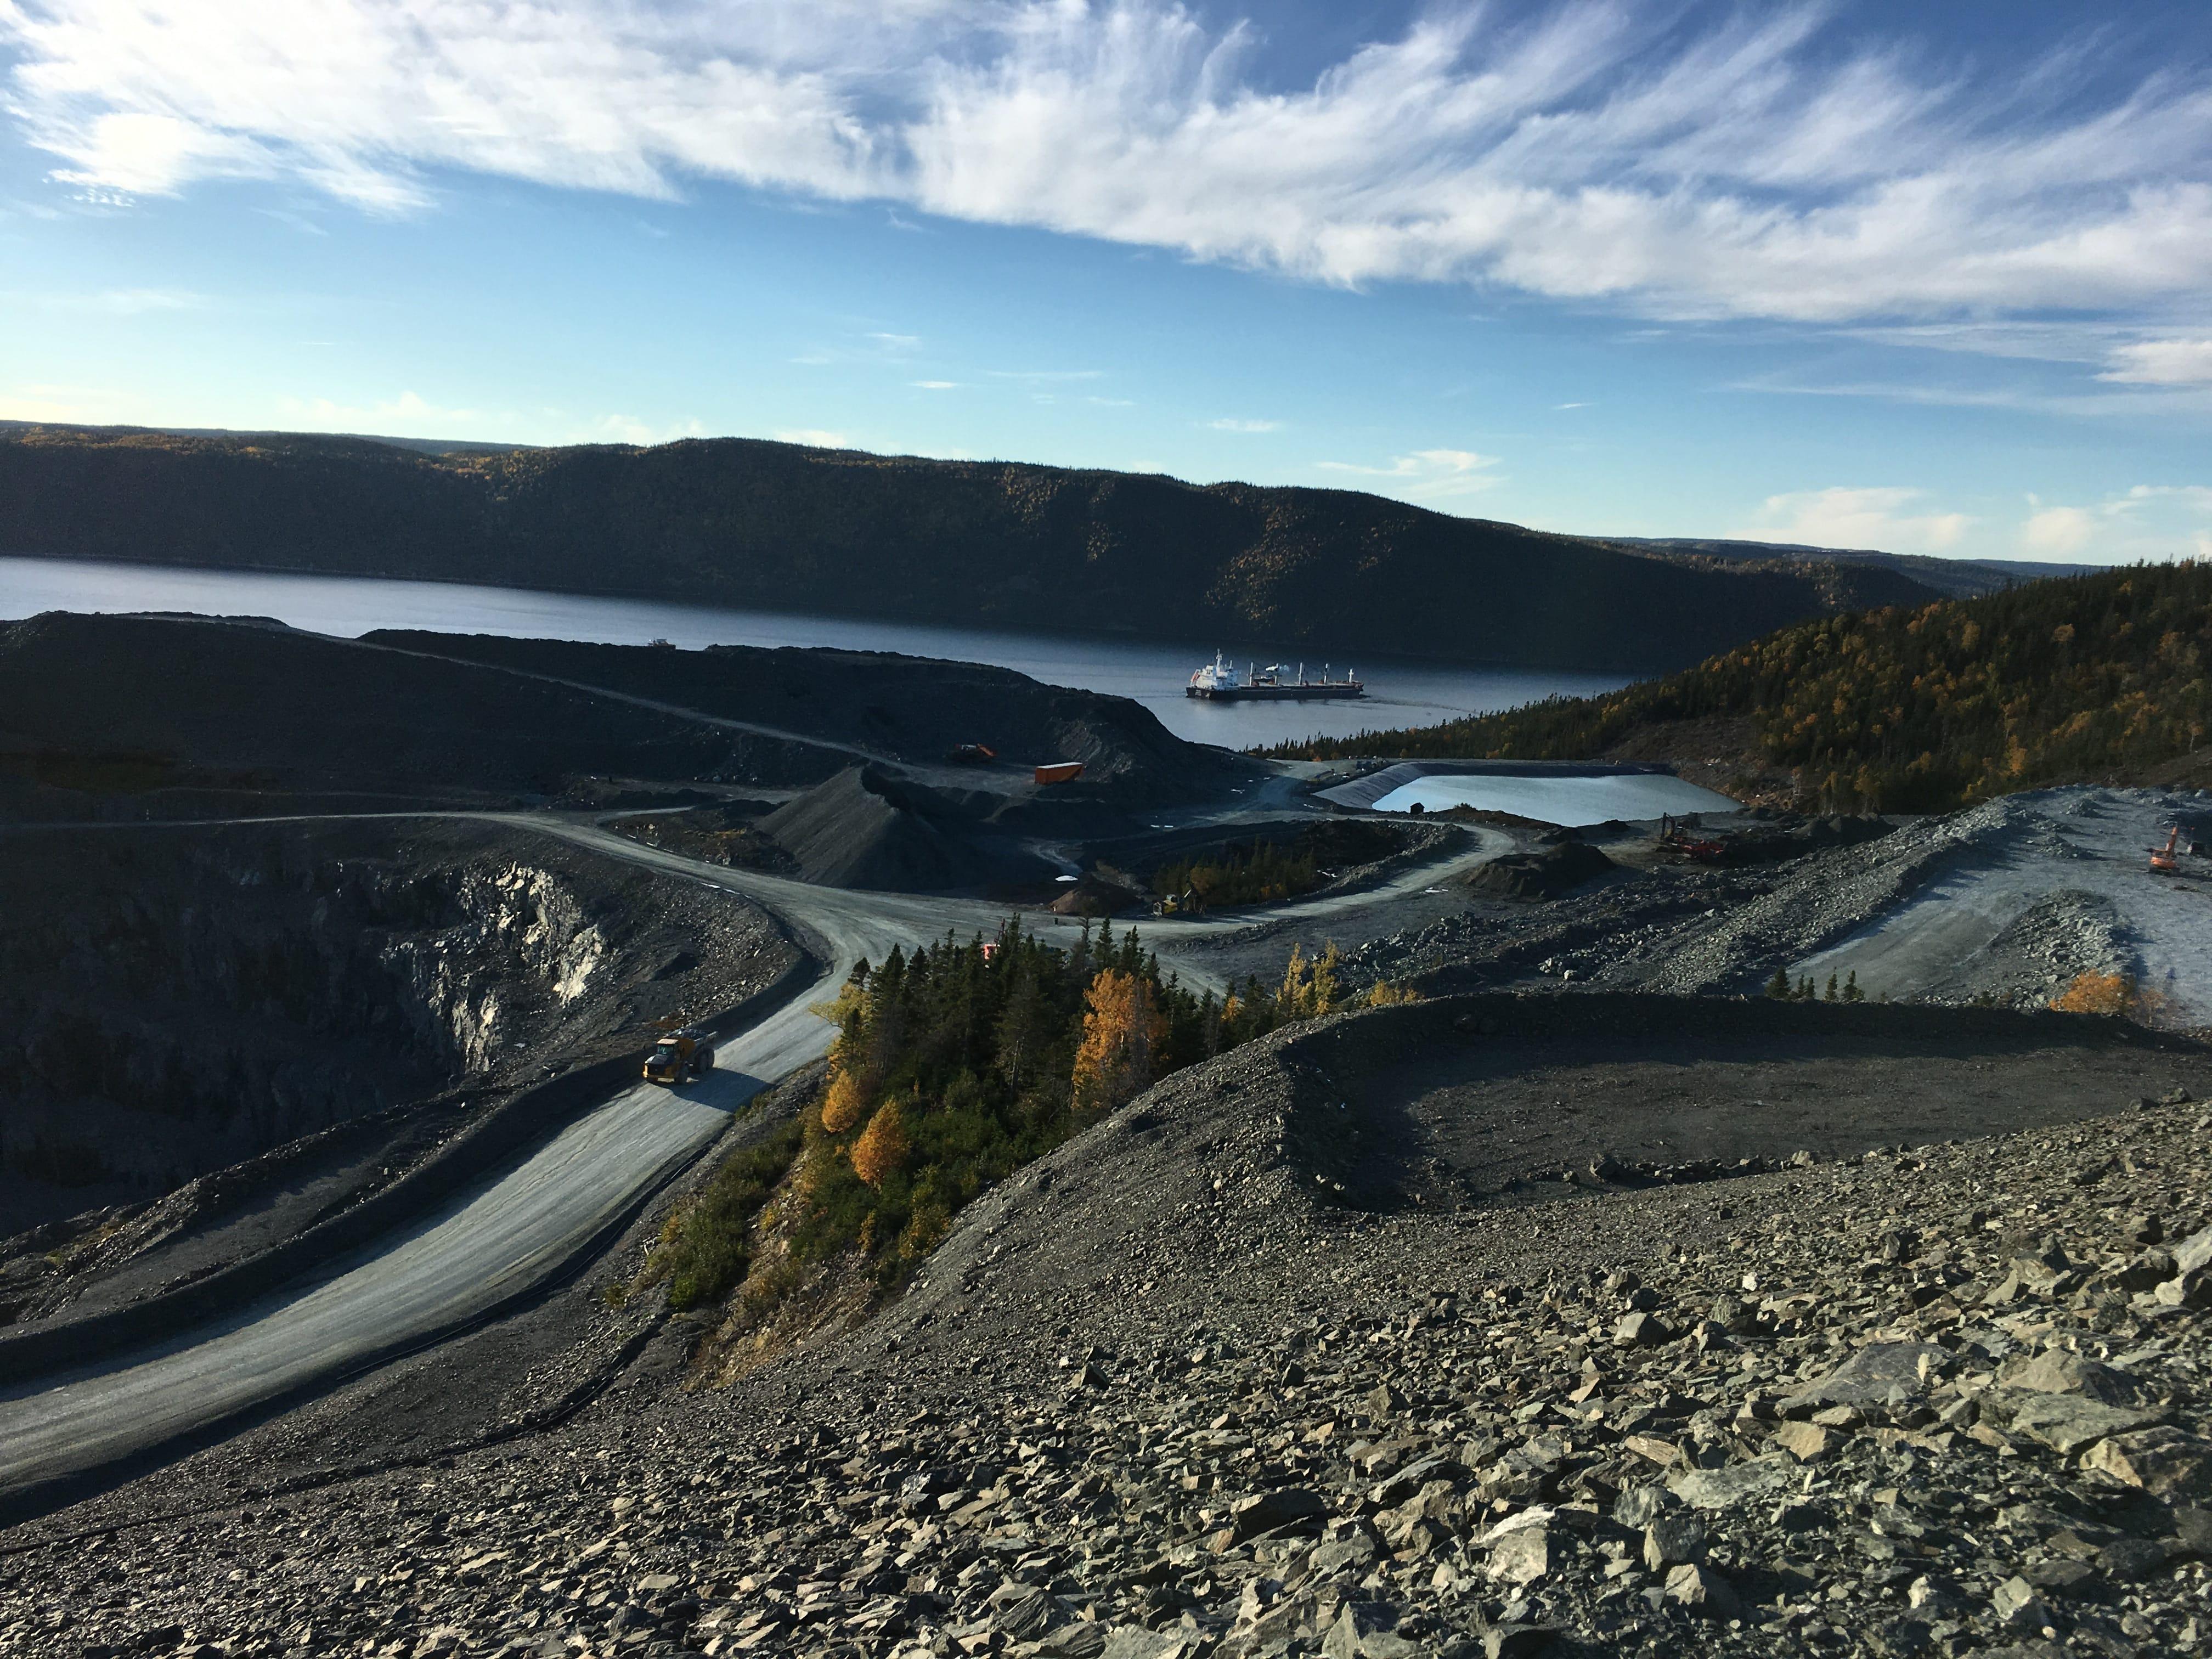 Anaconda's Gold Mining (TSX:ANX) Baie Verte Deposit in Newfoundland, Canada